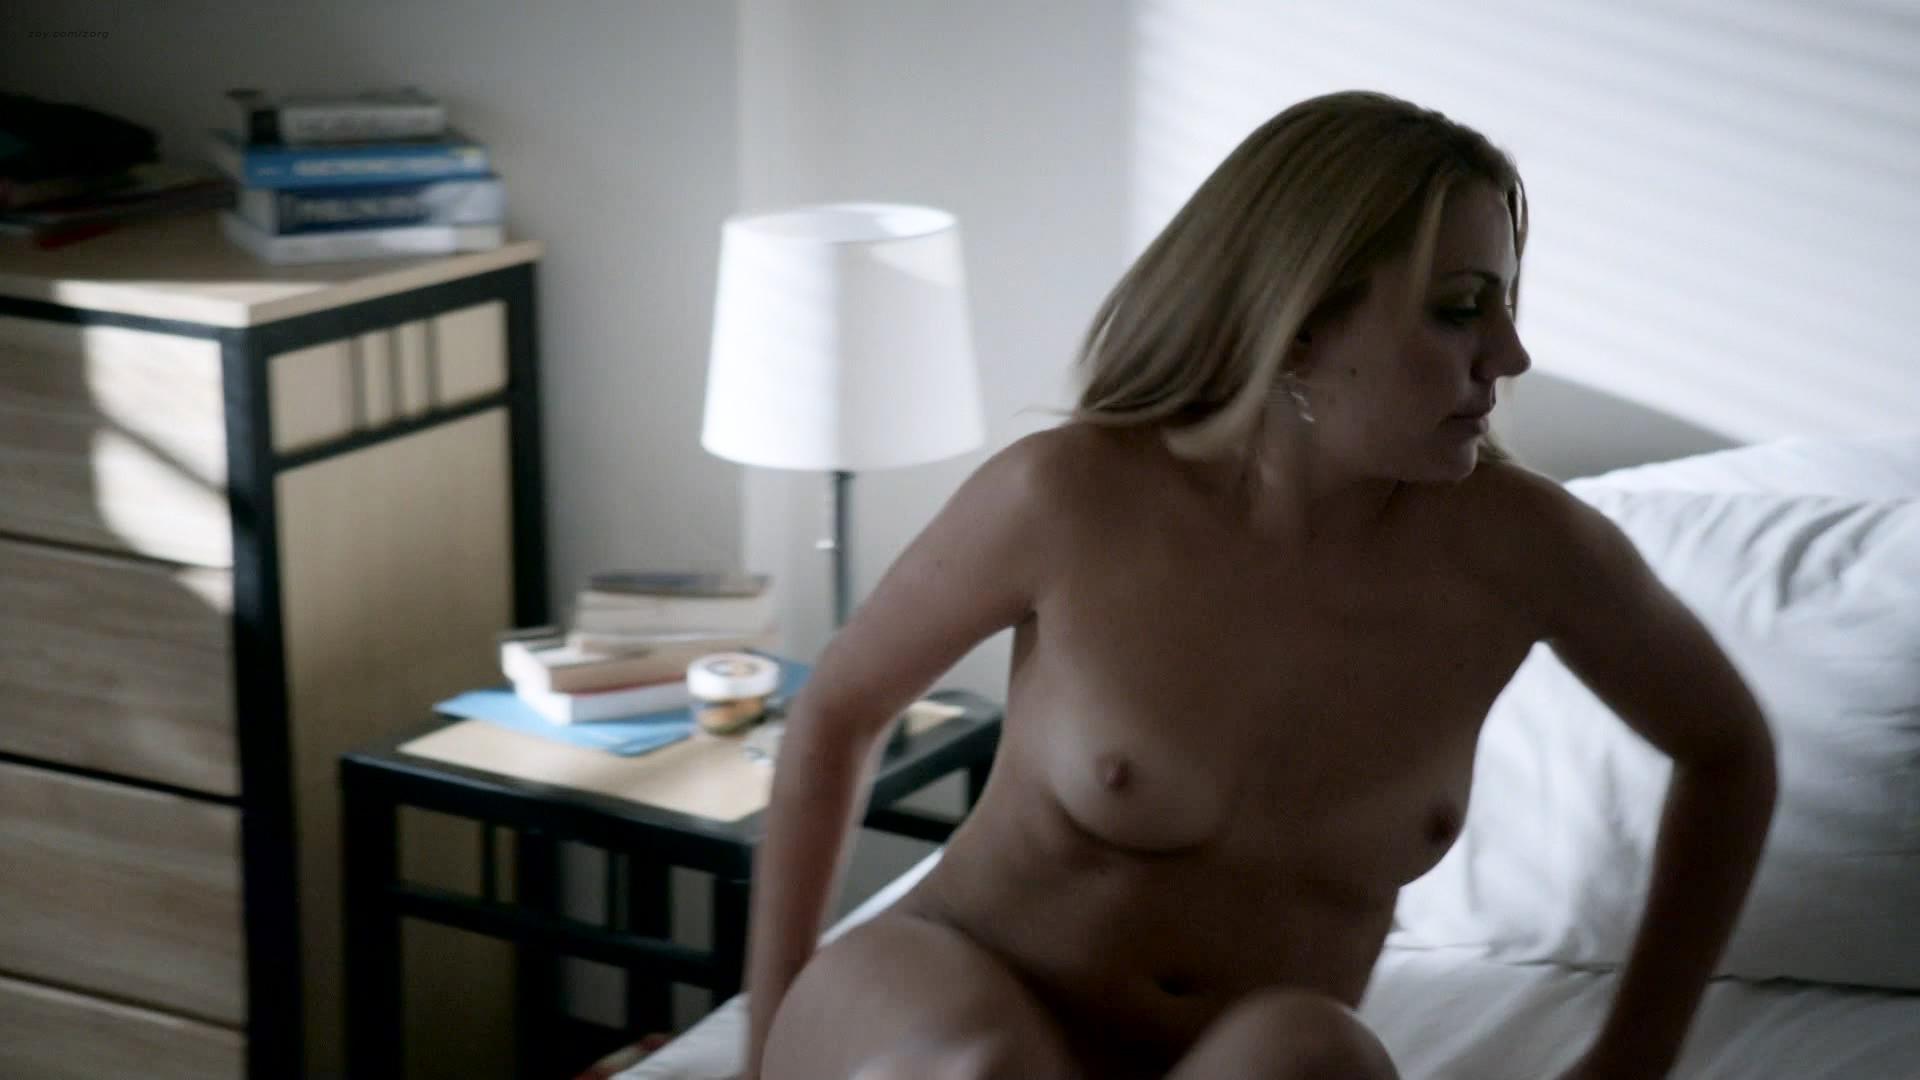 Sasha alexander nude photographs